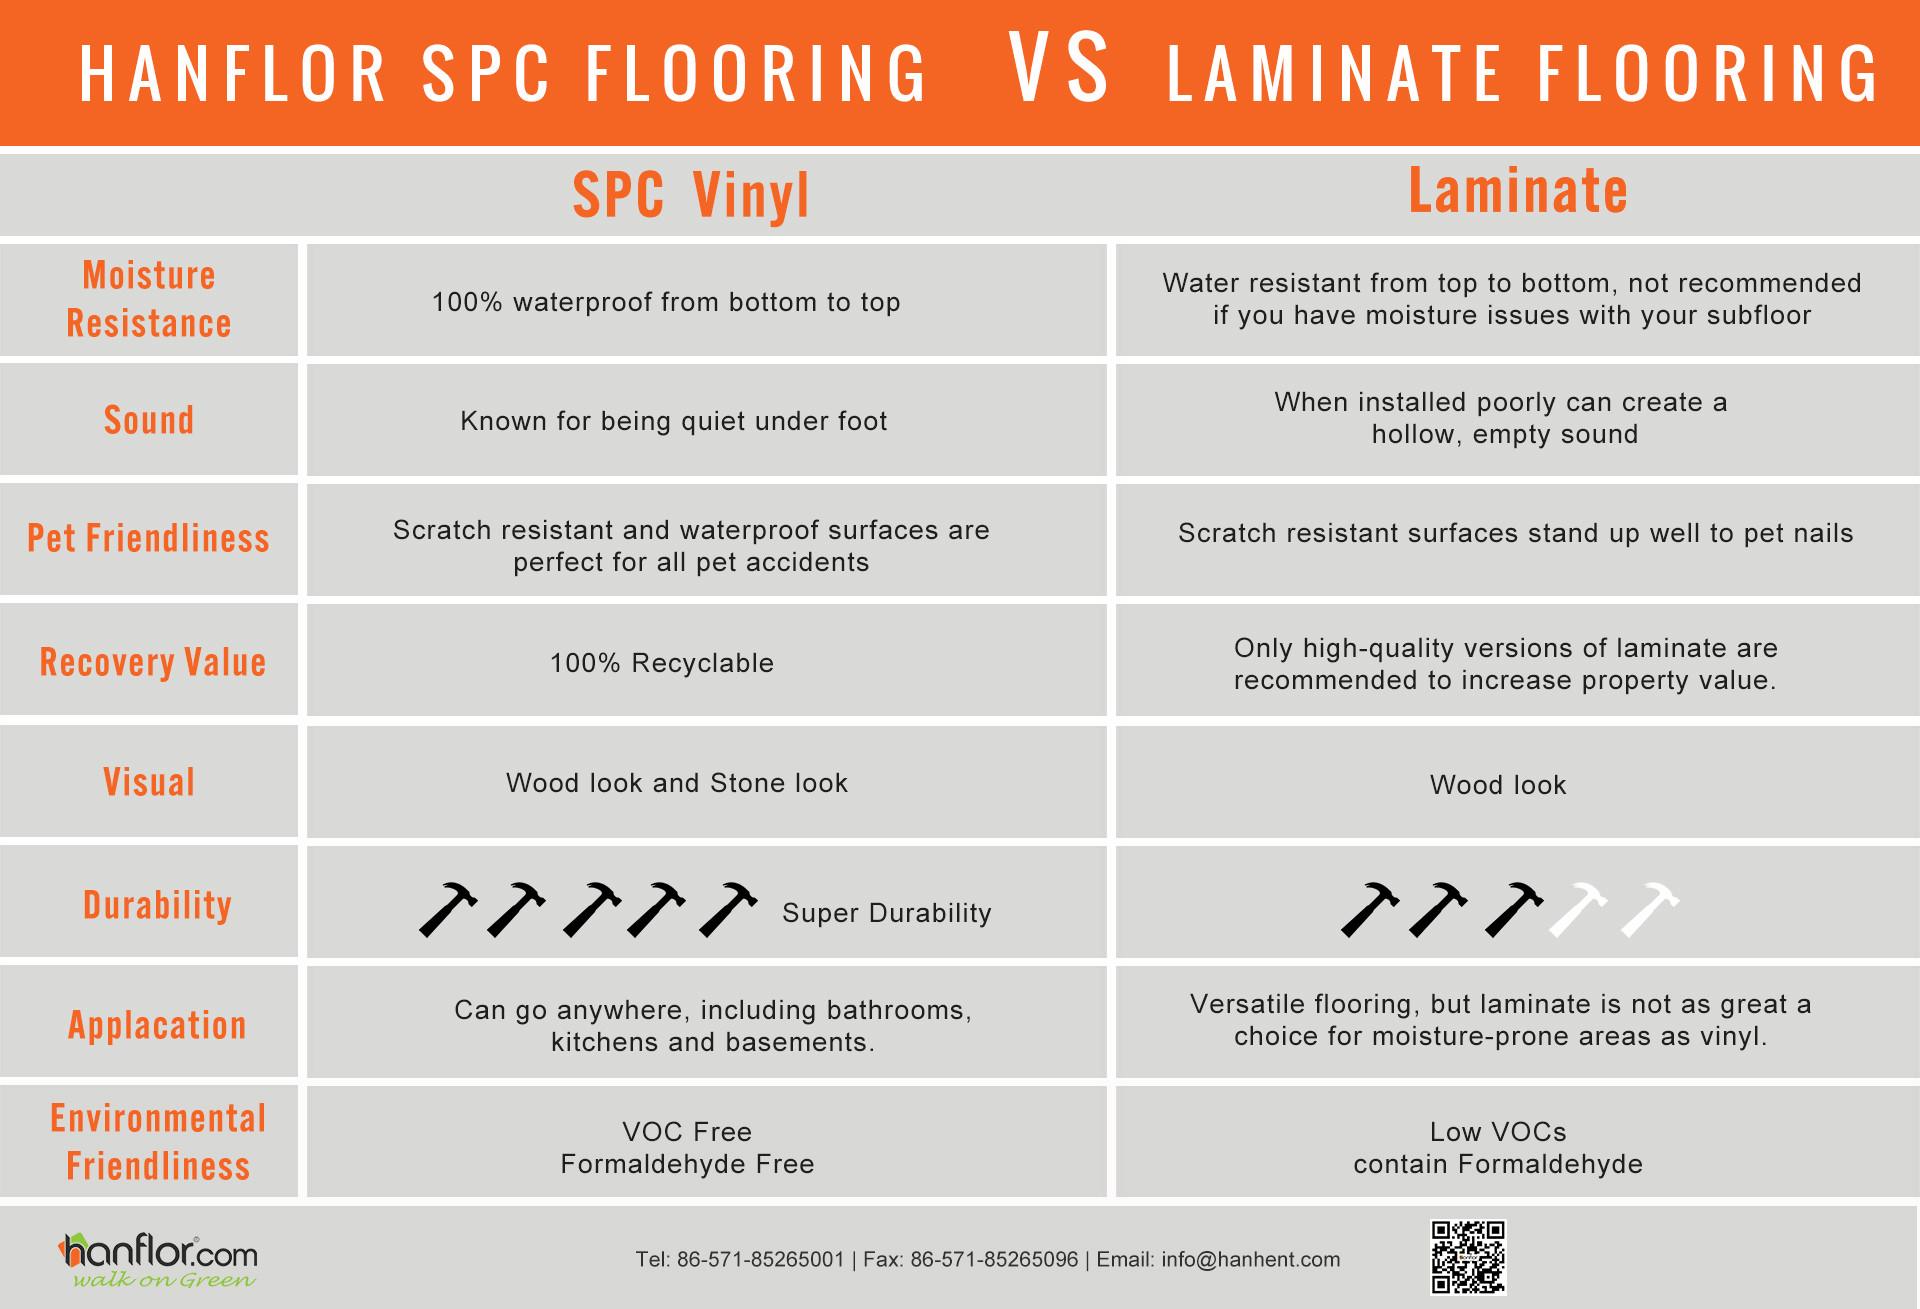 SPC flooring VS laminate flooring